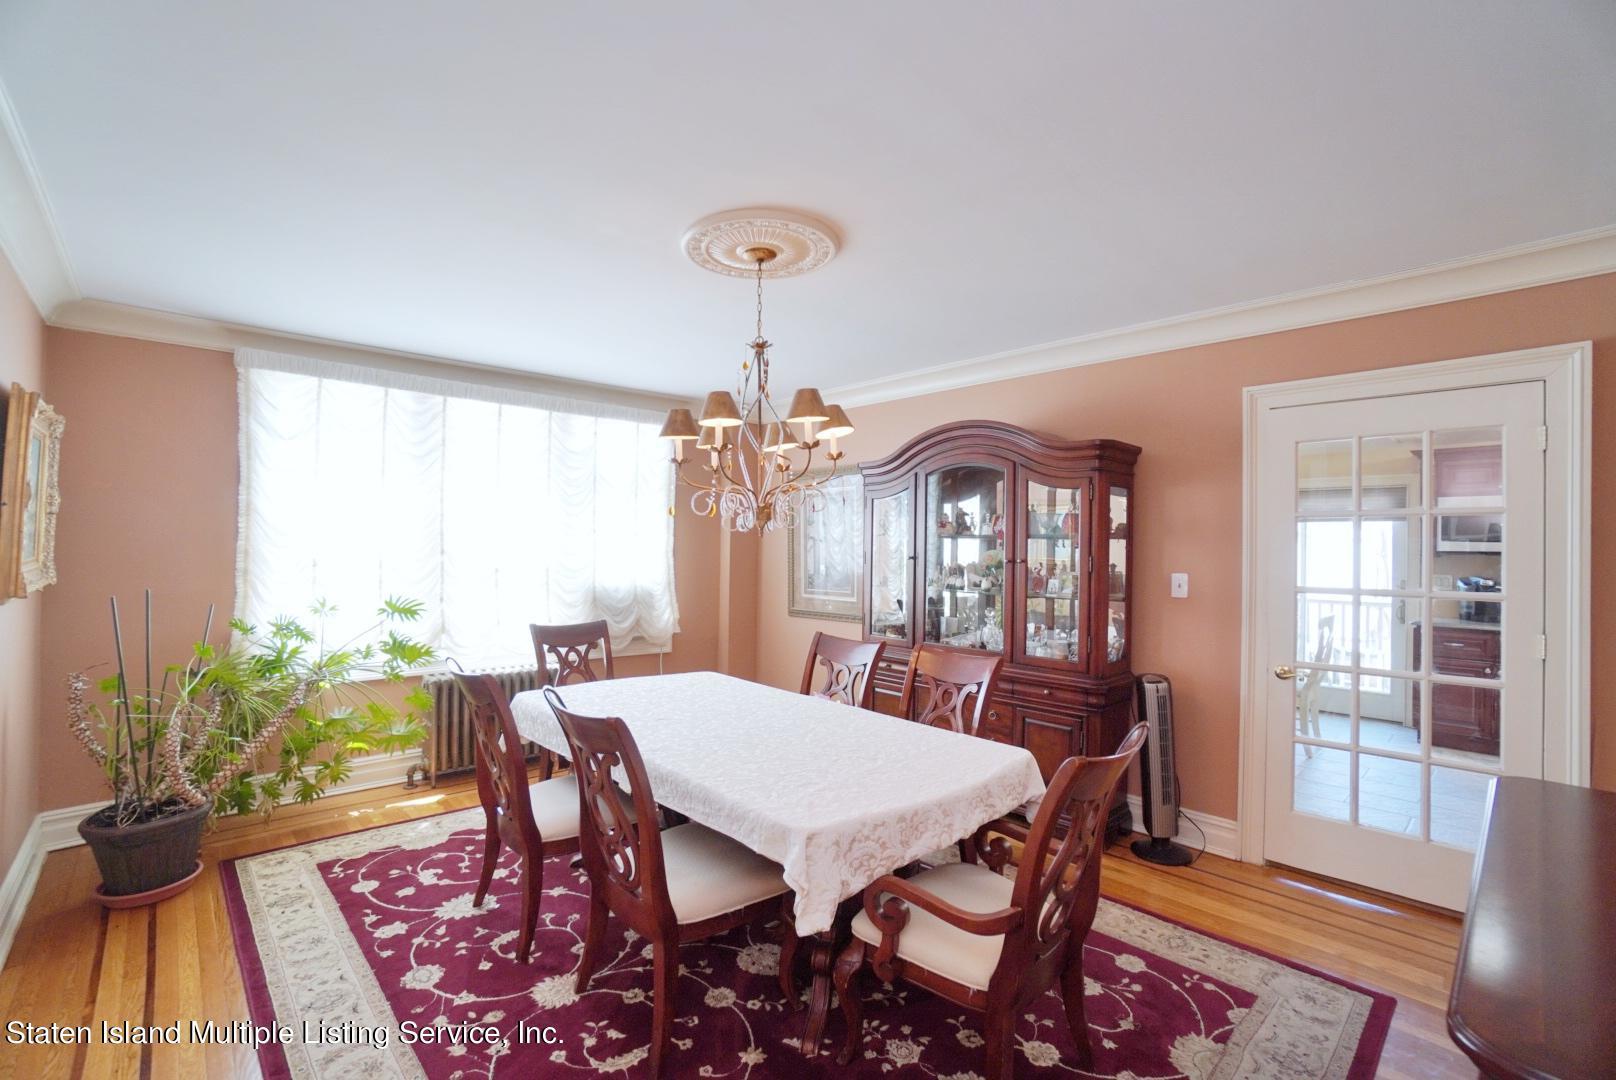 Single Family - Detached 264 Fisher Avenue  Staten Island, NY 10307, MLS-1146898-17